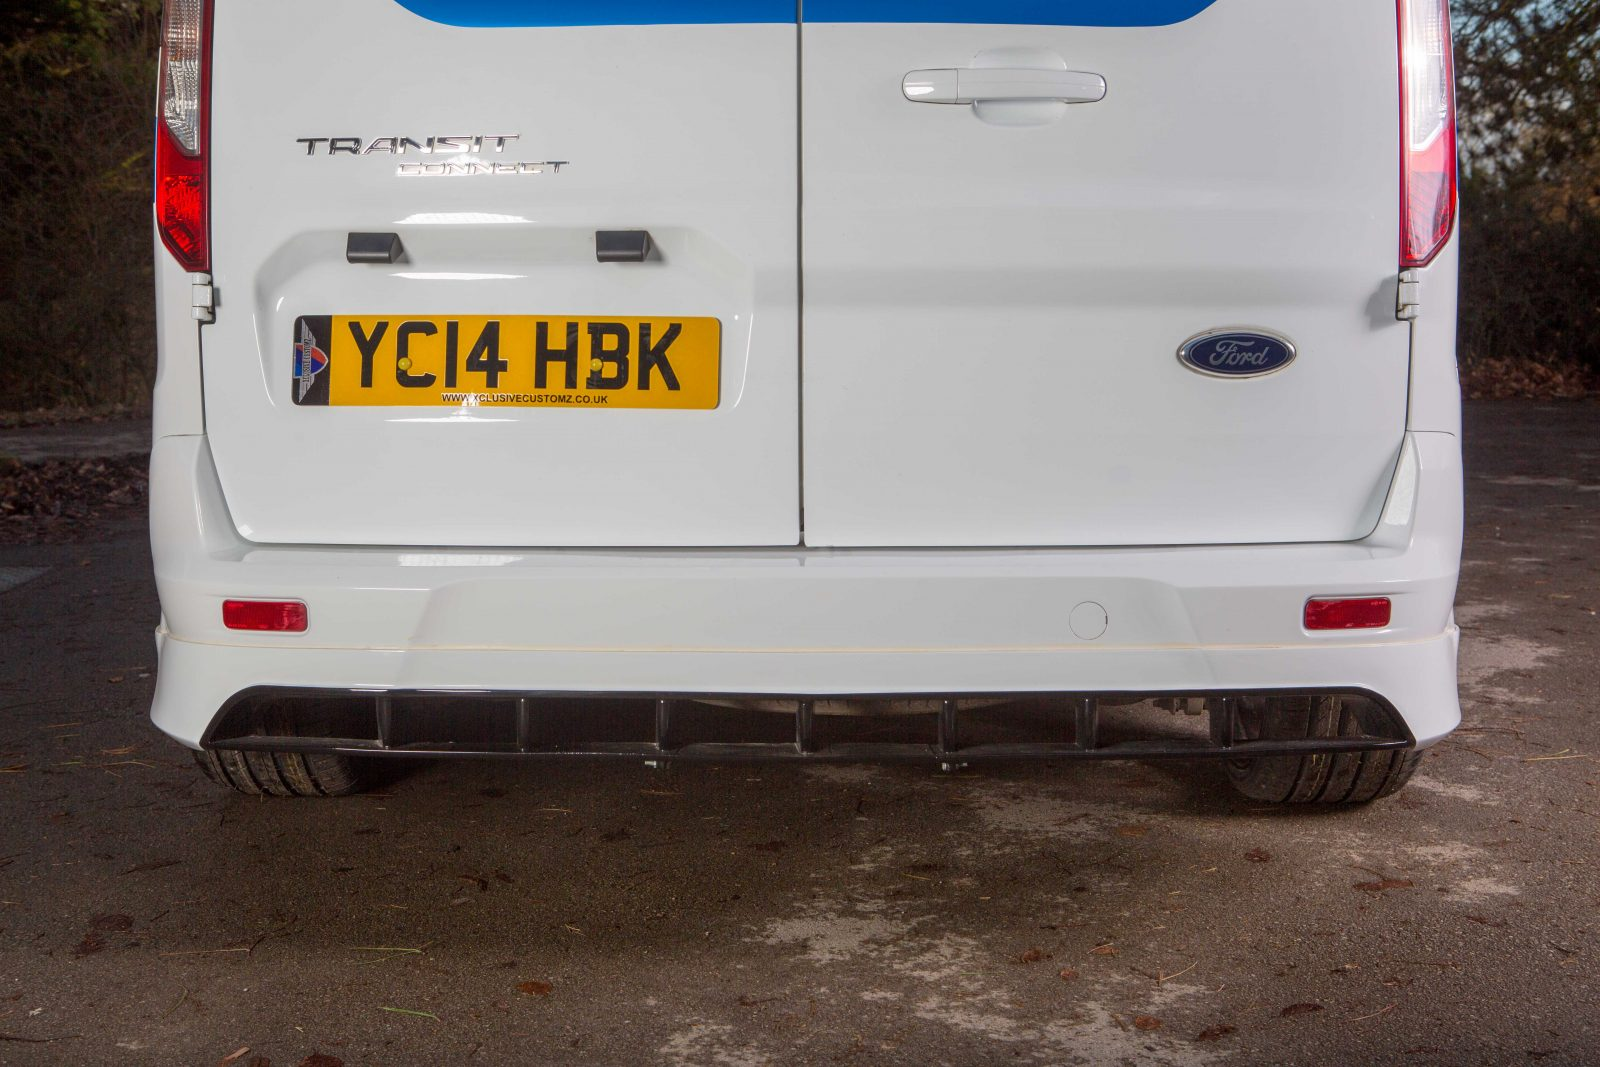 Transit-Bodykit-11-of-12-1600x1067.jpg